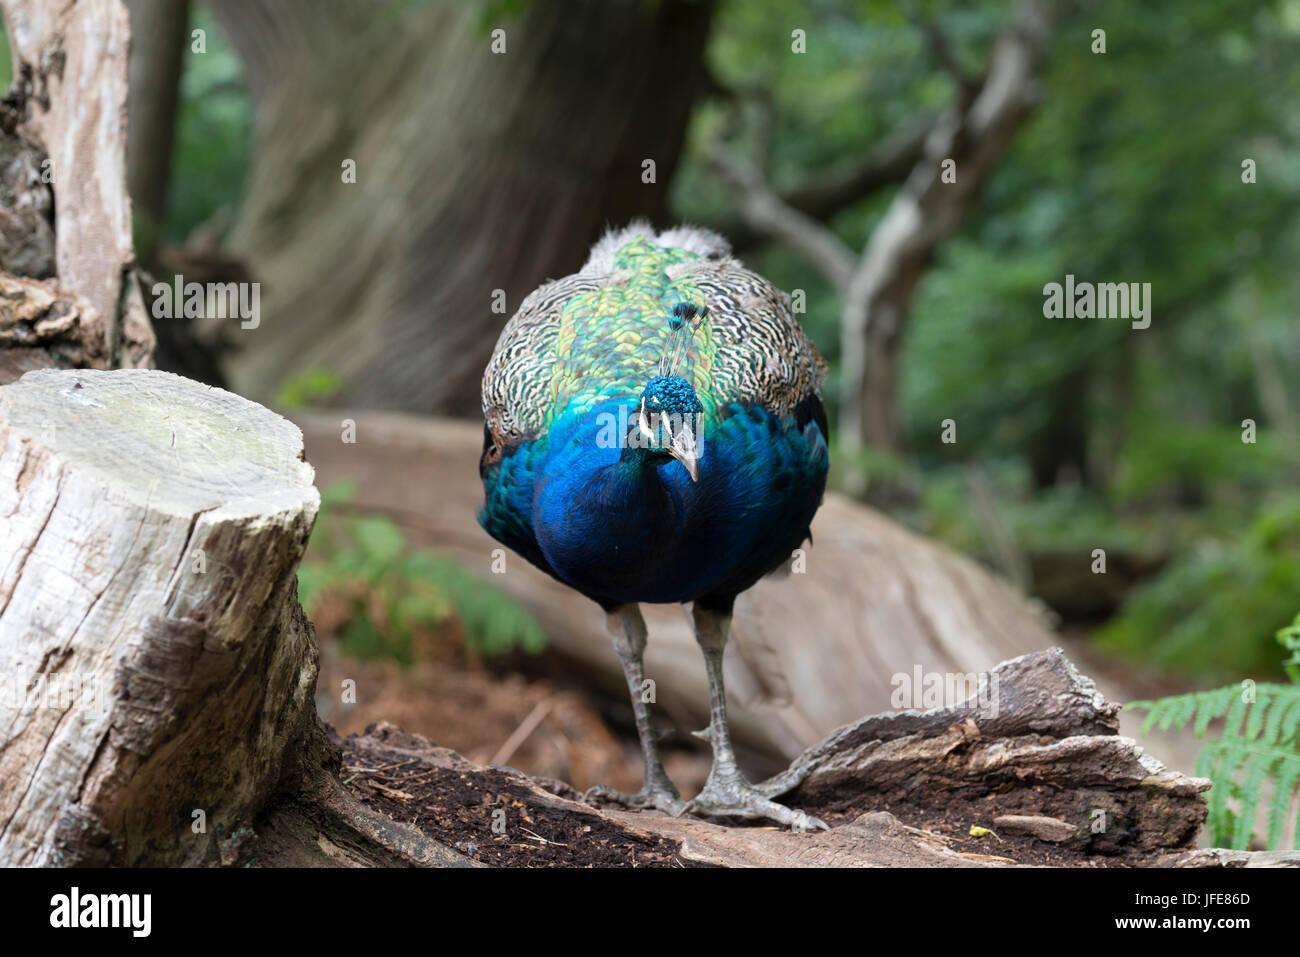 Peacock - Male on Log - Stock Image